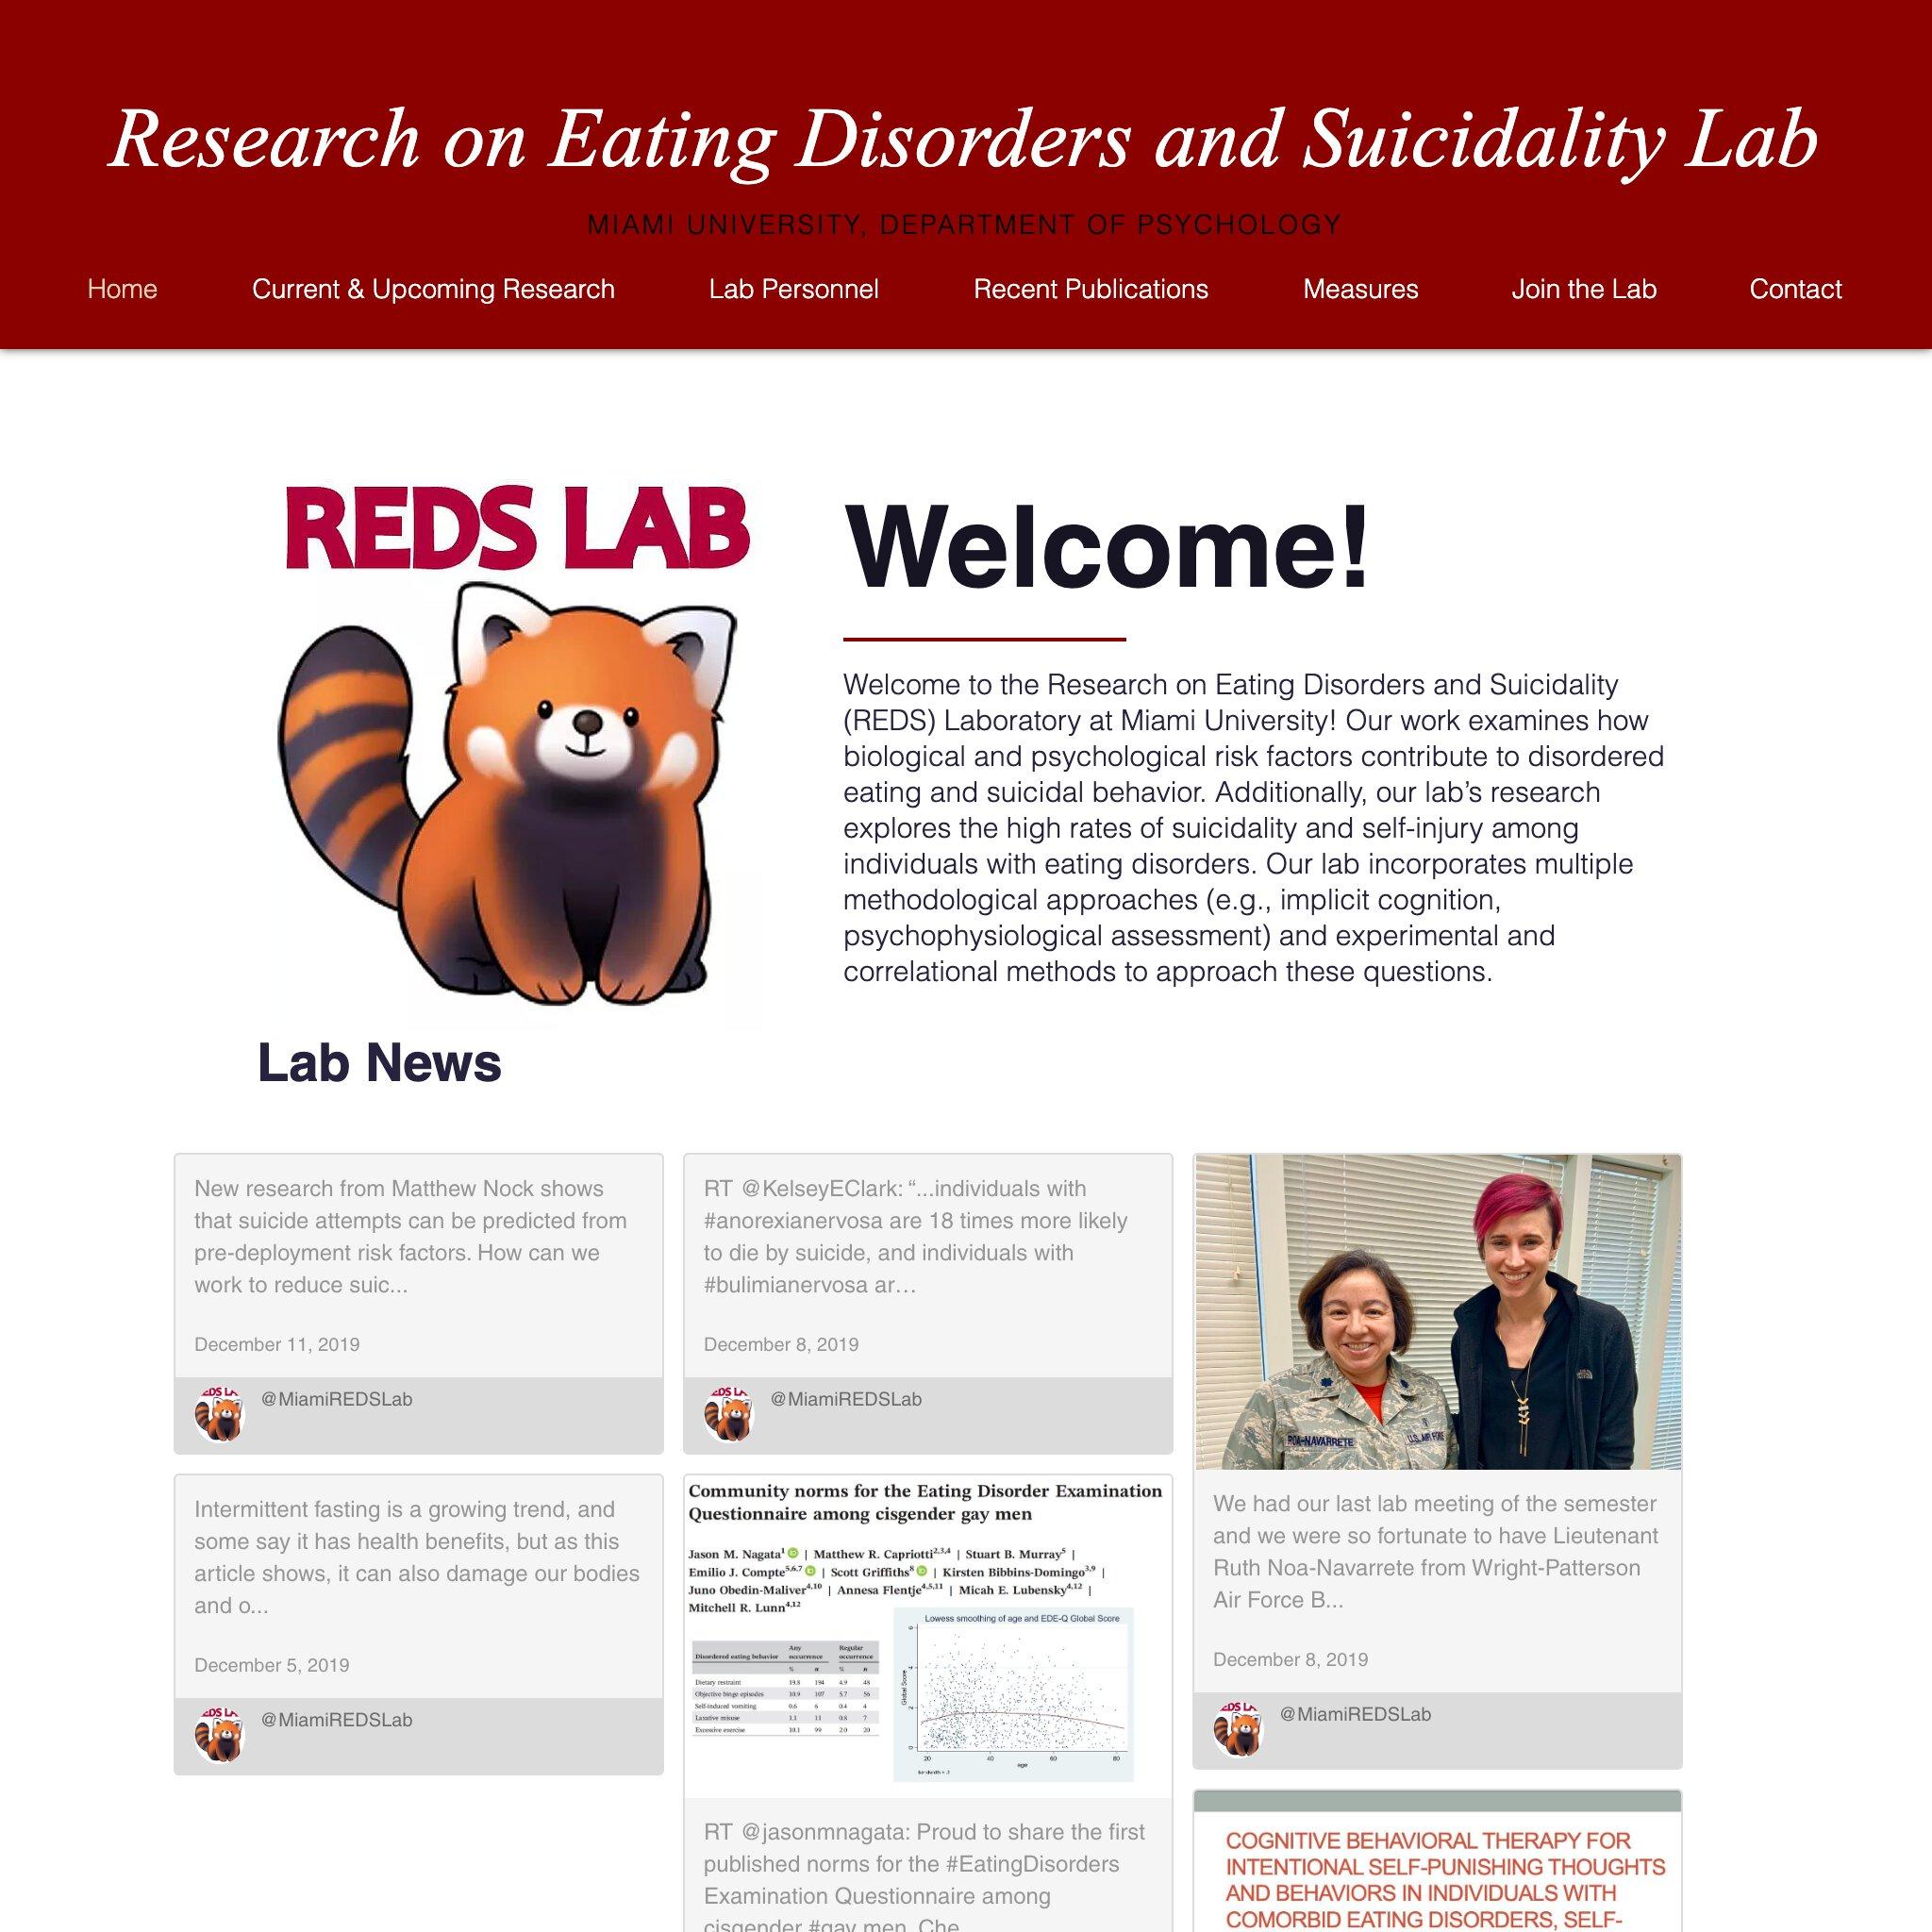 Reds lab